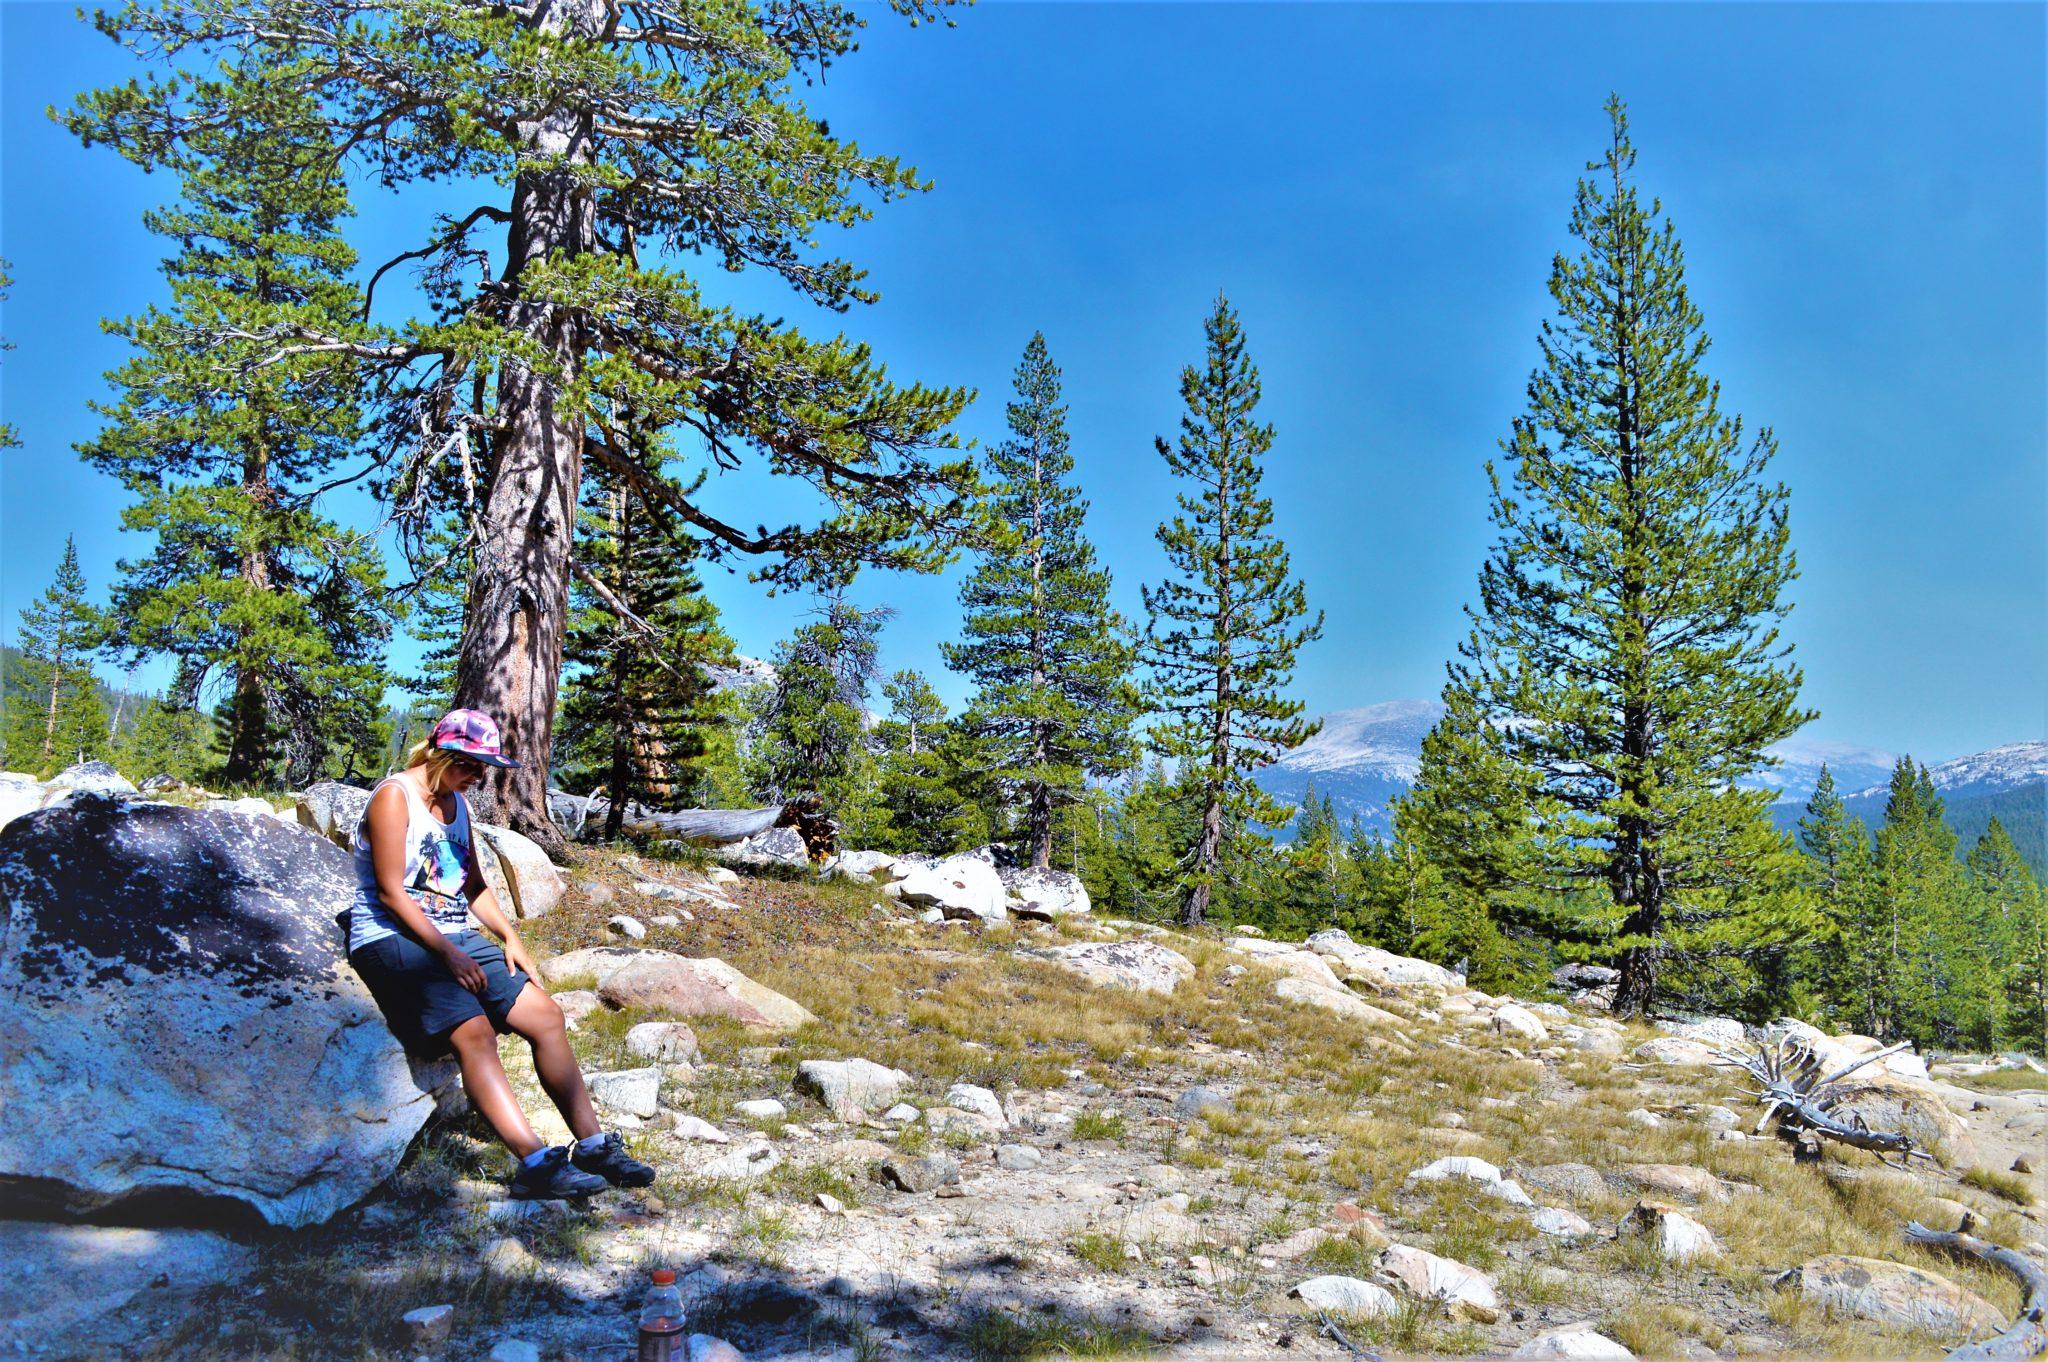 Resting on PCT, Yosemite National Park, California